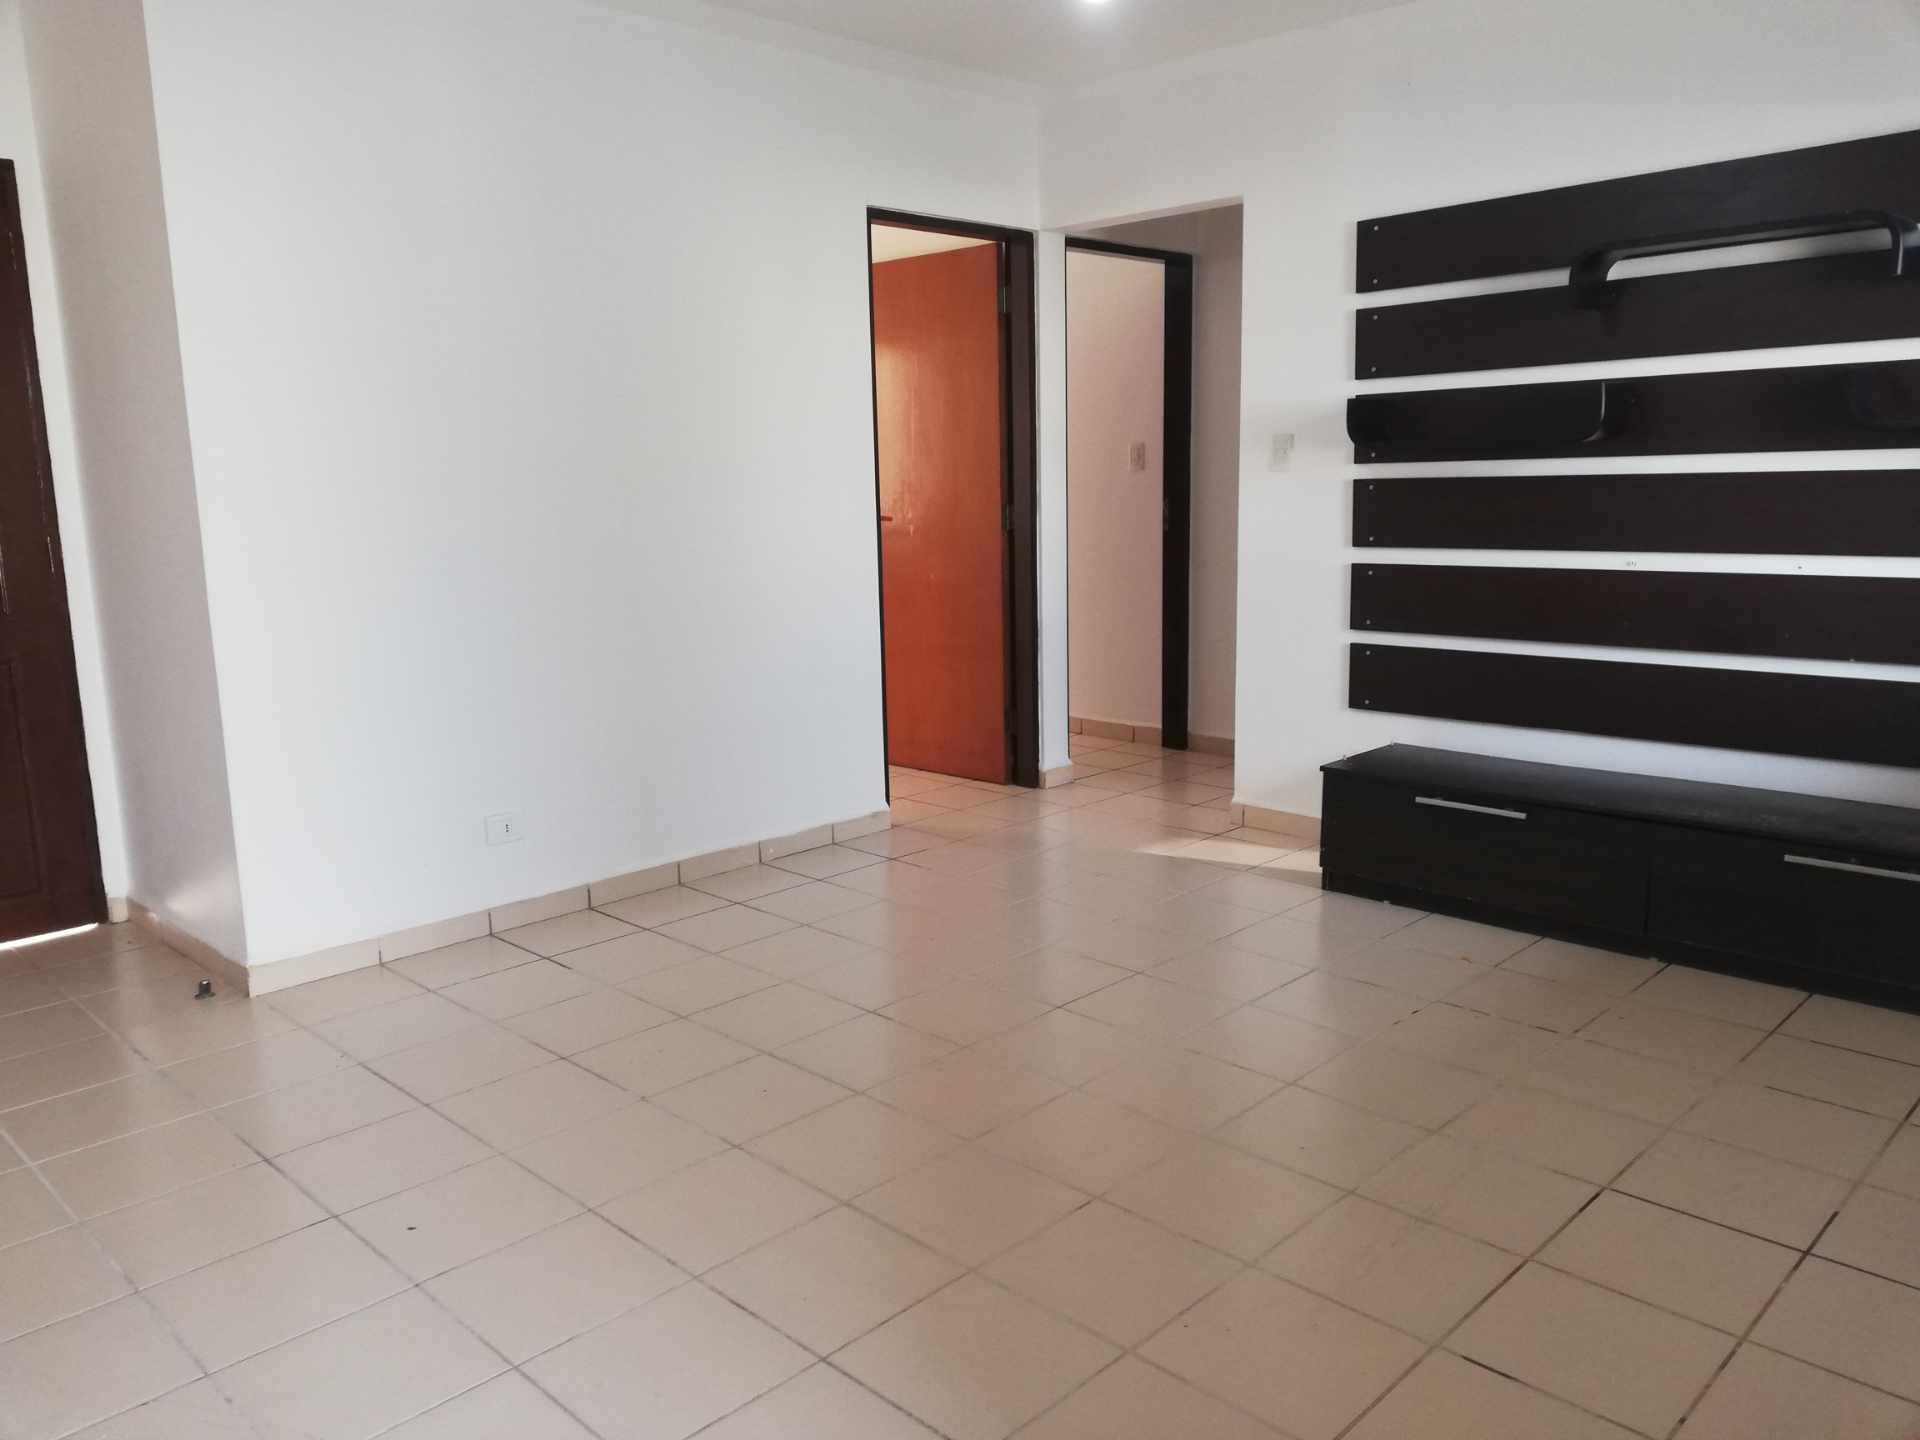 Casa en Venta Av Banzer Km. 10, Condominio Sevilla Terrazas II Foto 2